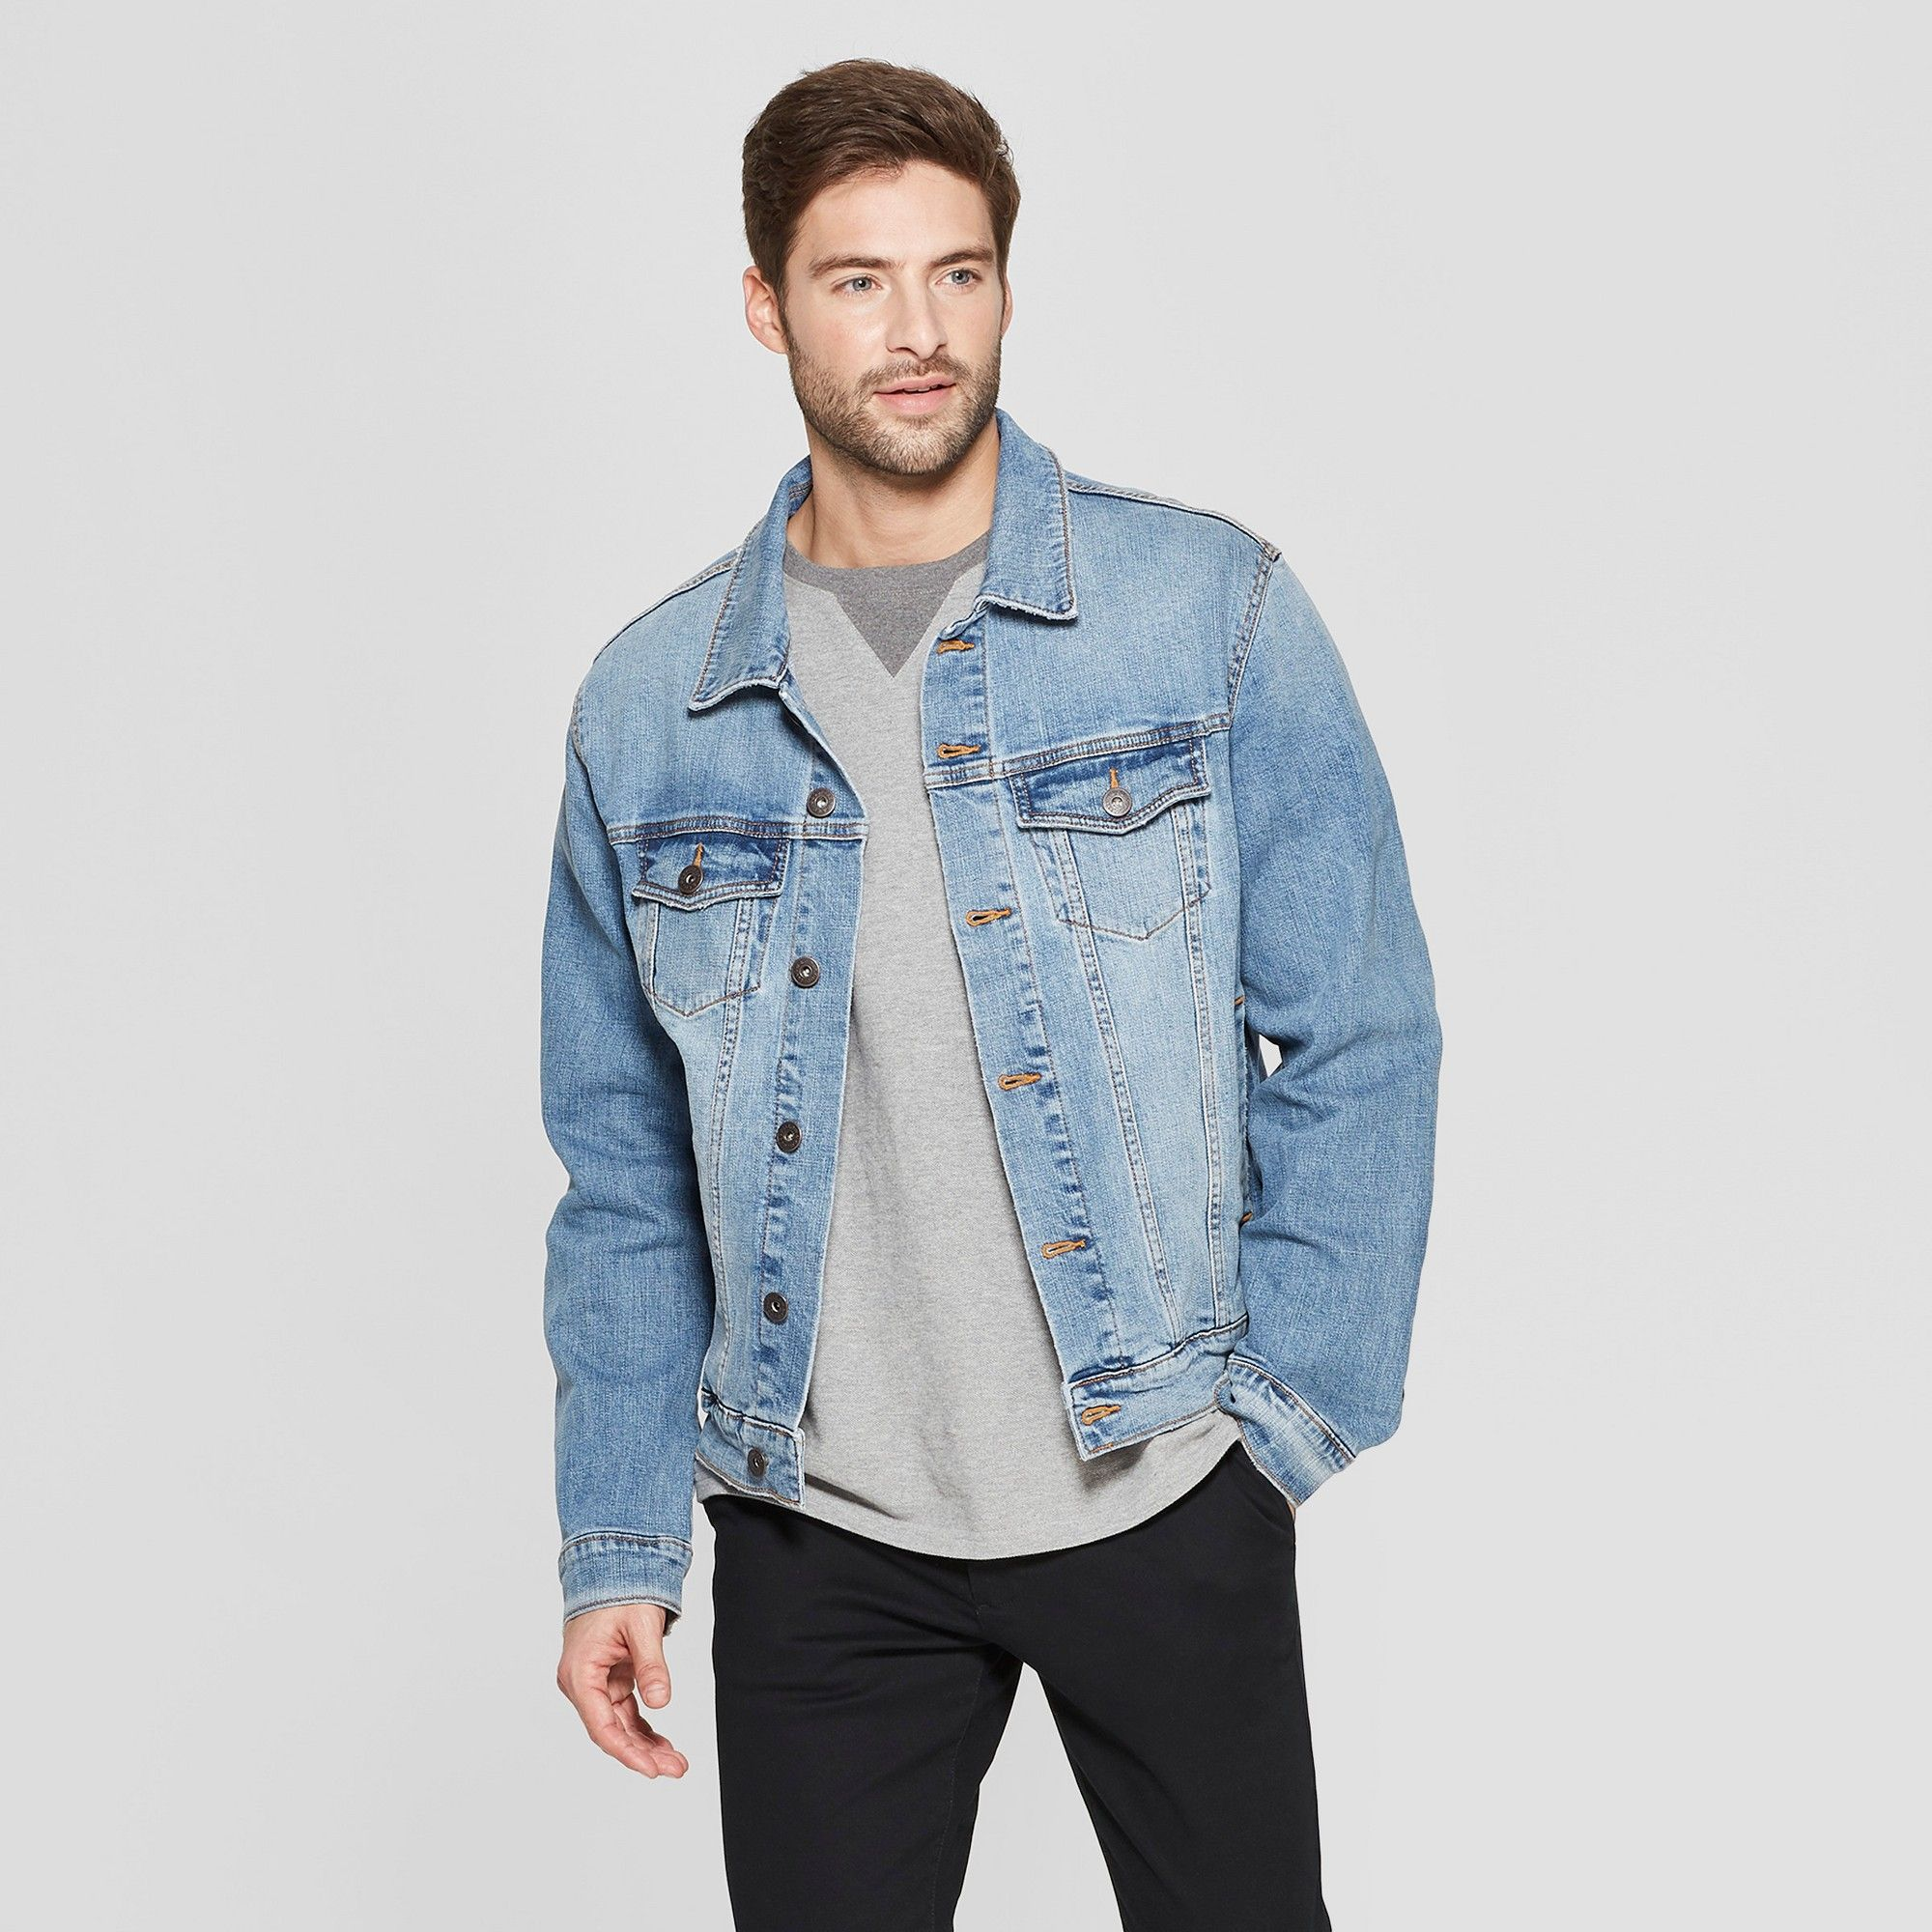 Men S Denim Trucker Jacket Goodfellow Co Light Wash Xxl Light Wash Denim Jacket Denim Jacket Men Jacket Outfits [ 2000 x 2000 Pixel ]